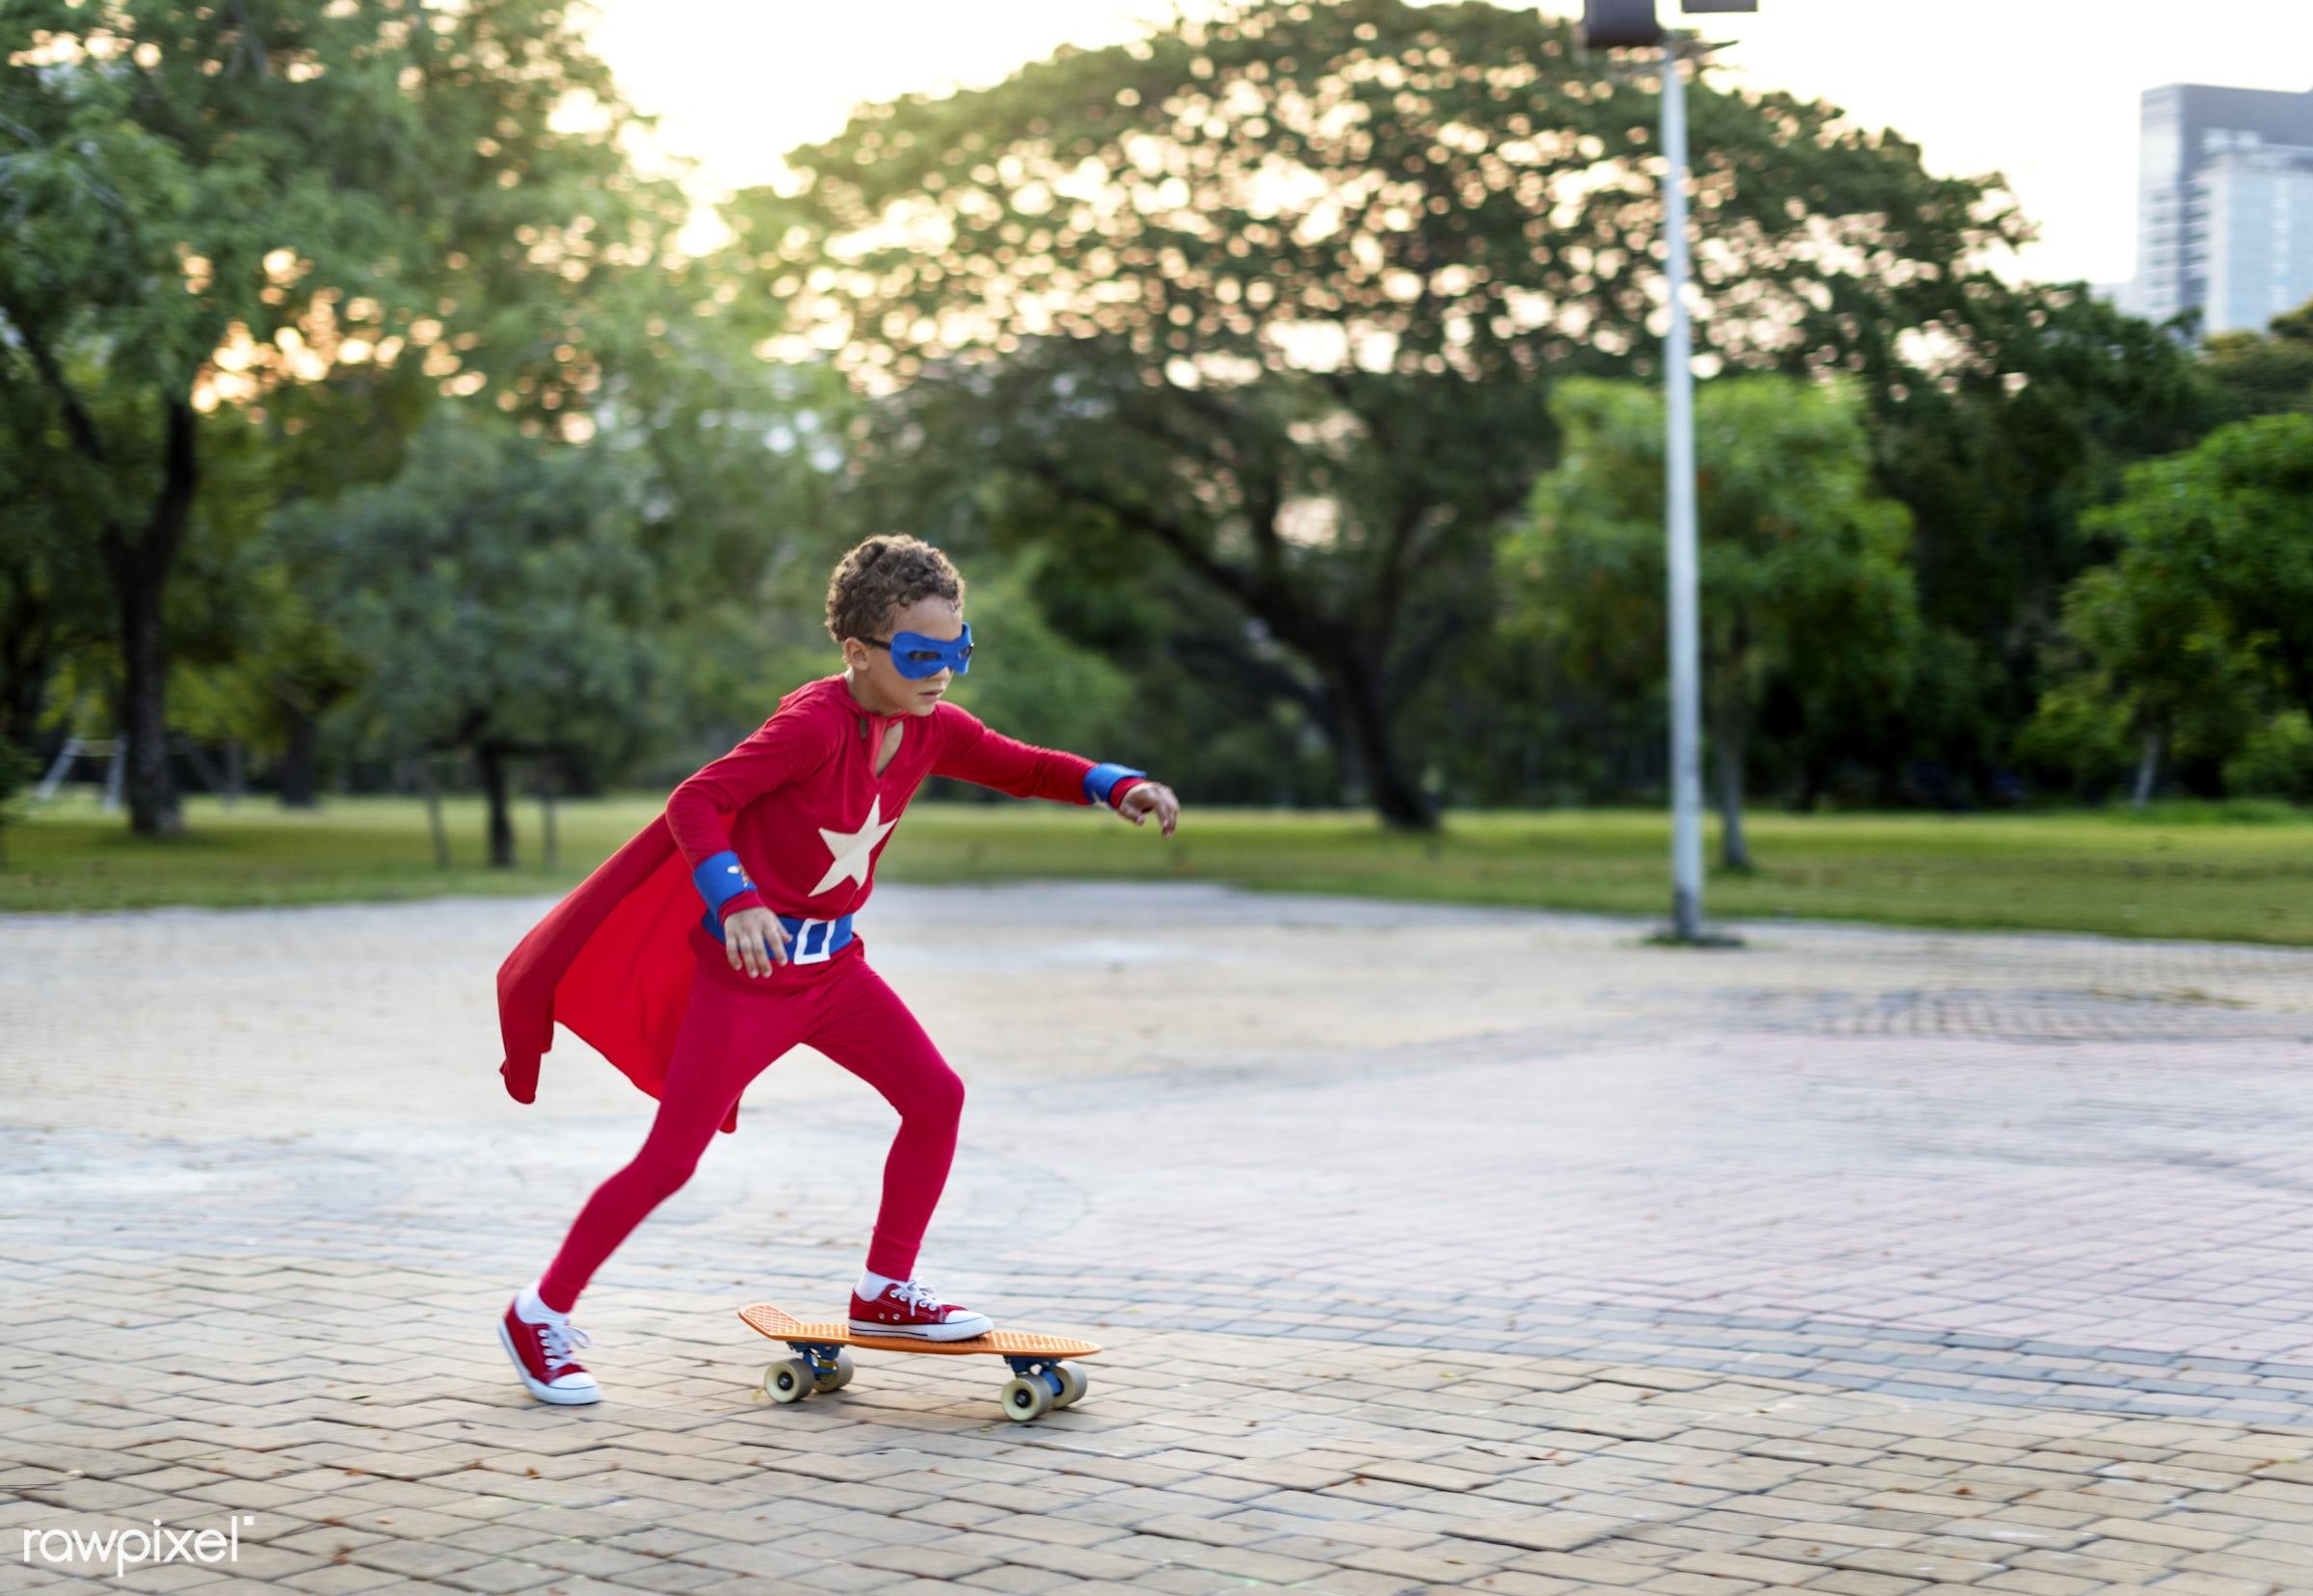 Superhero boy on a skateboard - hero, game, superhero, activity, aspirations, boy, brave, cheerful, child, childhood,...